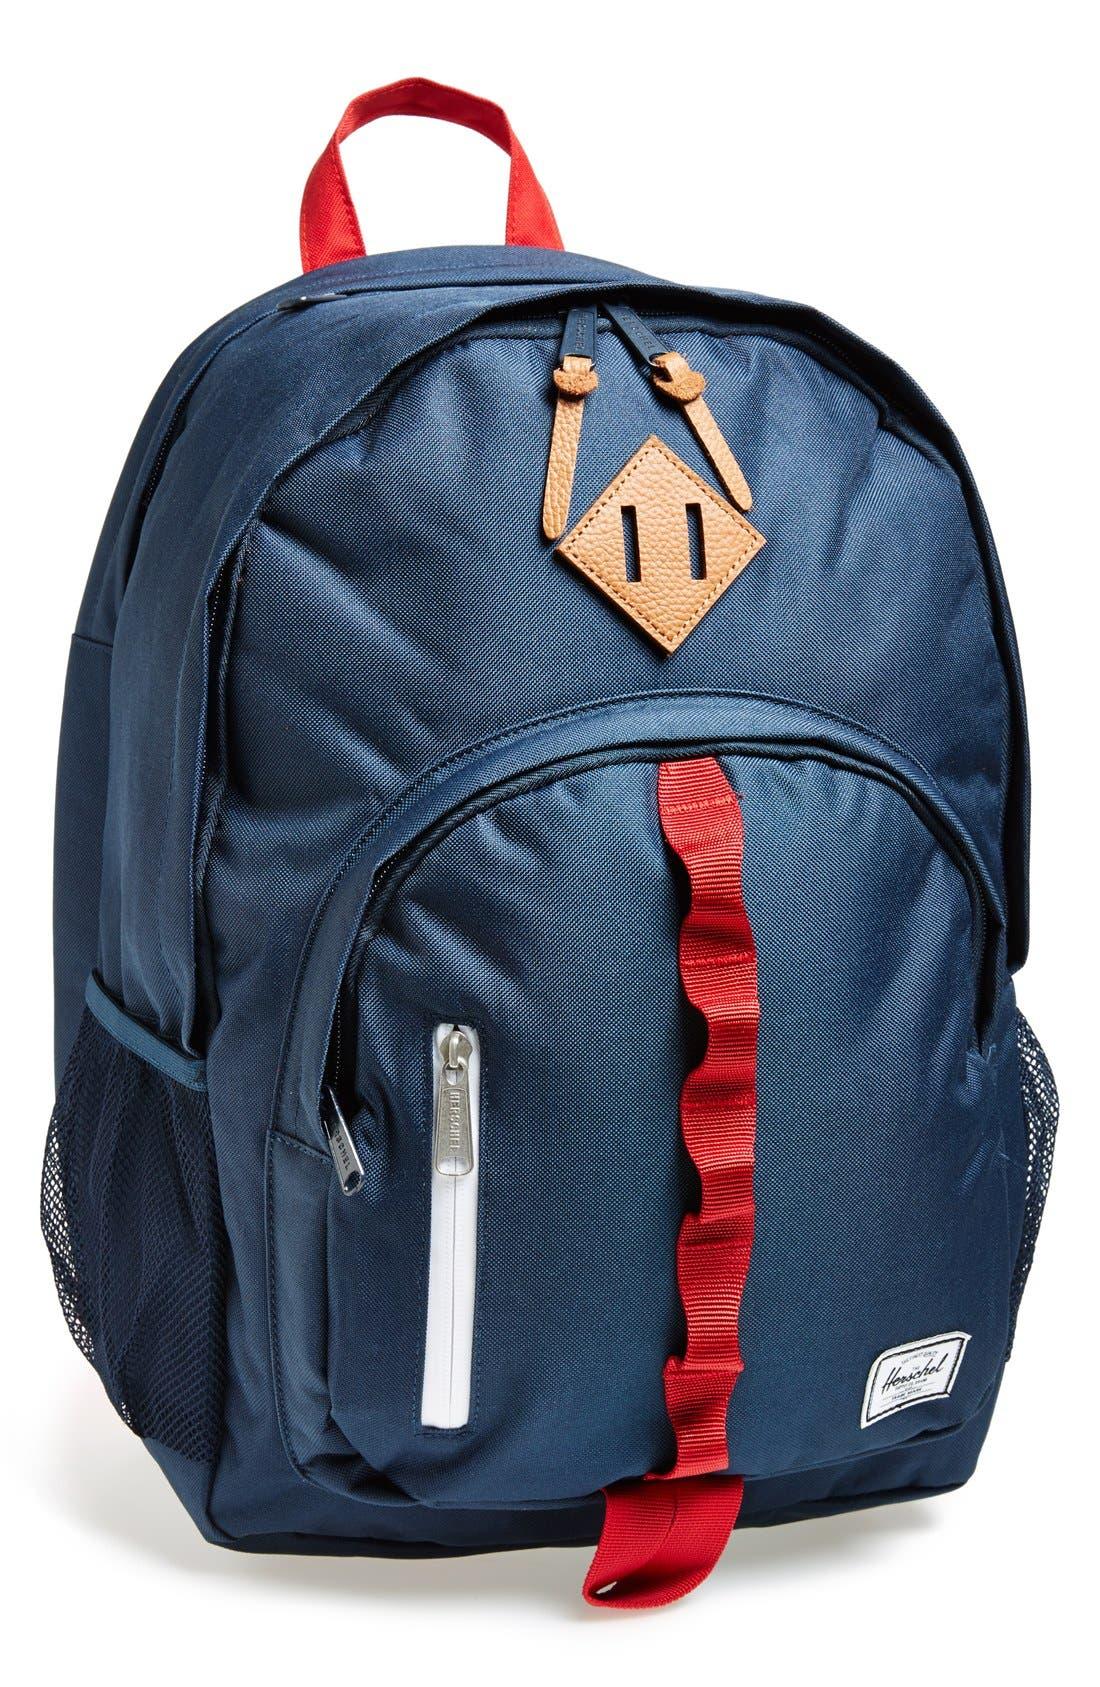 Alternate Image 1 Selected - Herschel Supply Co. 'Parkgate' Backpack